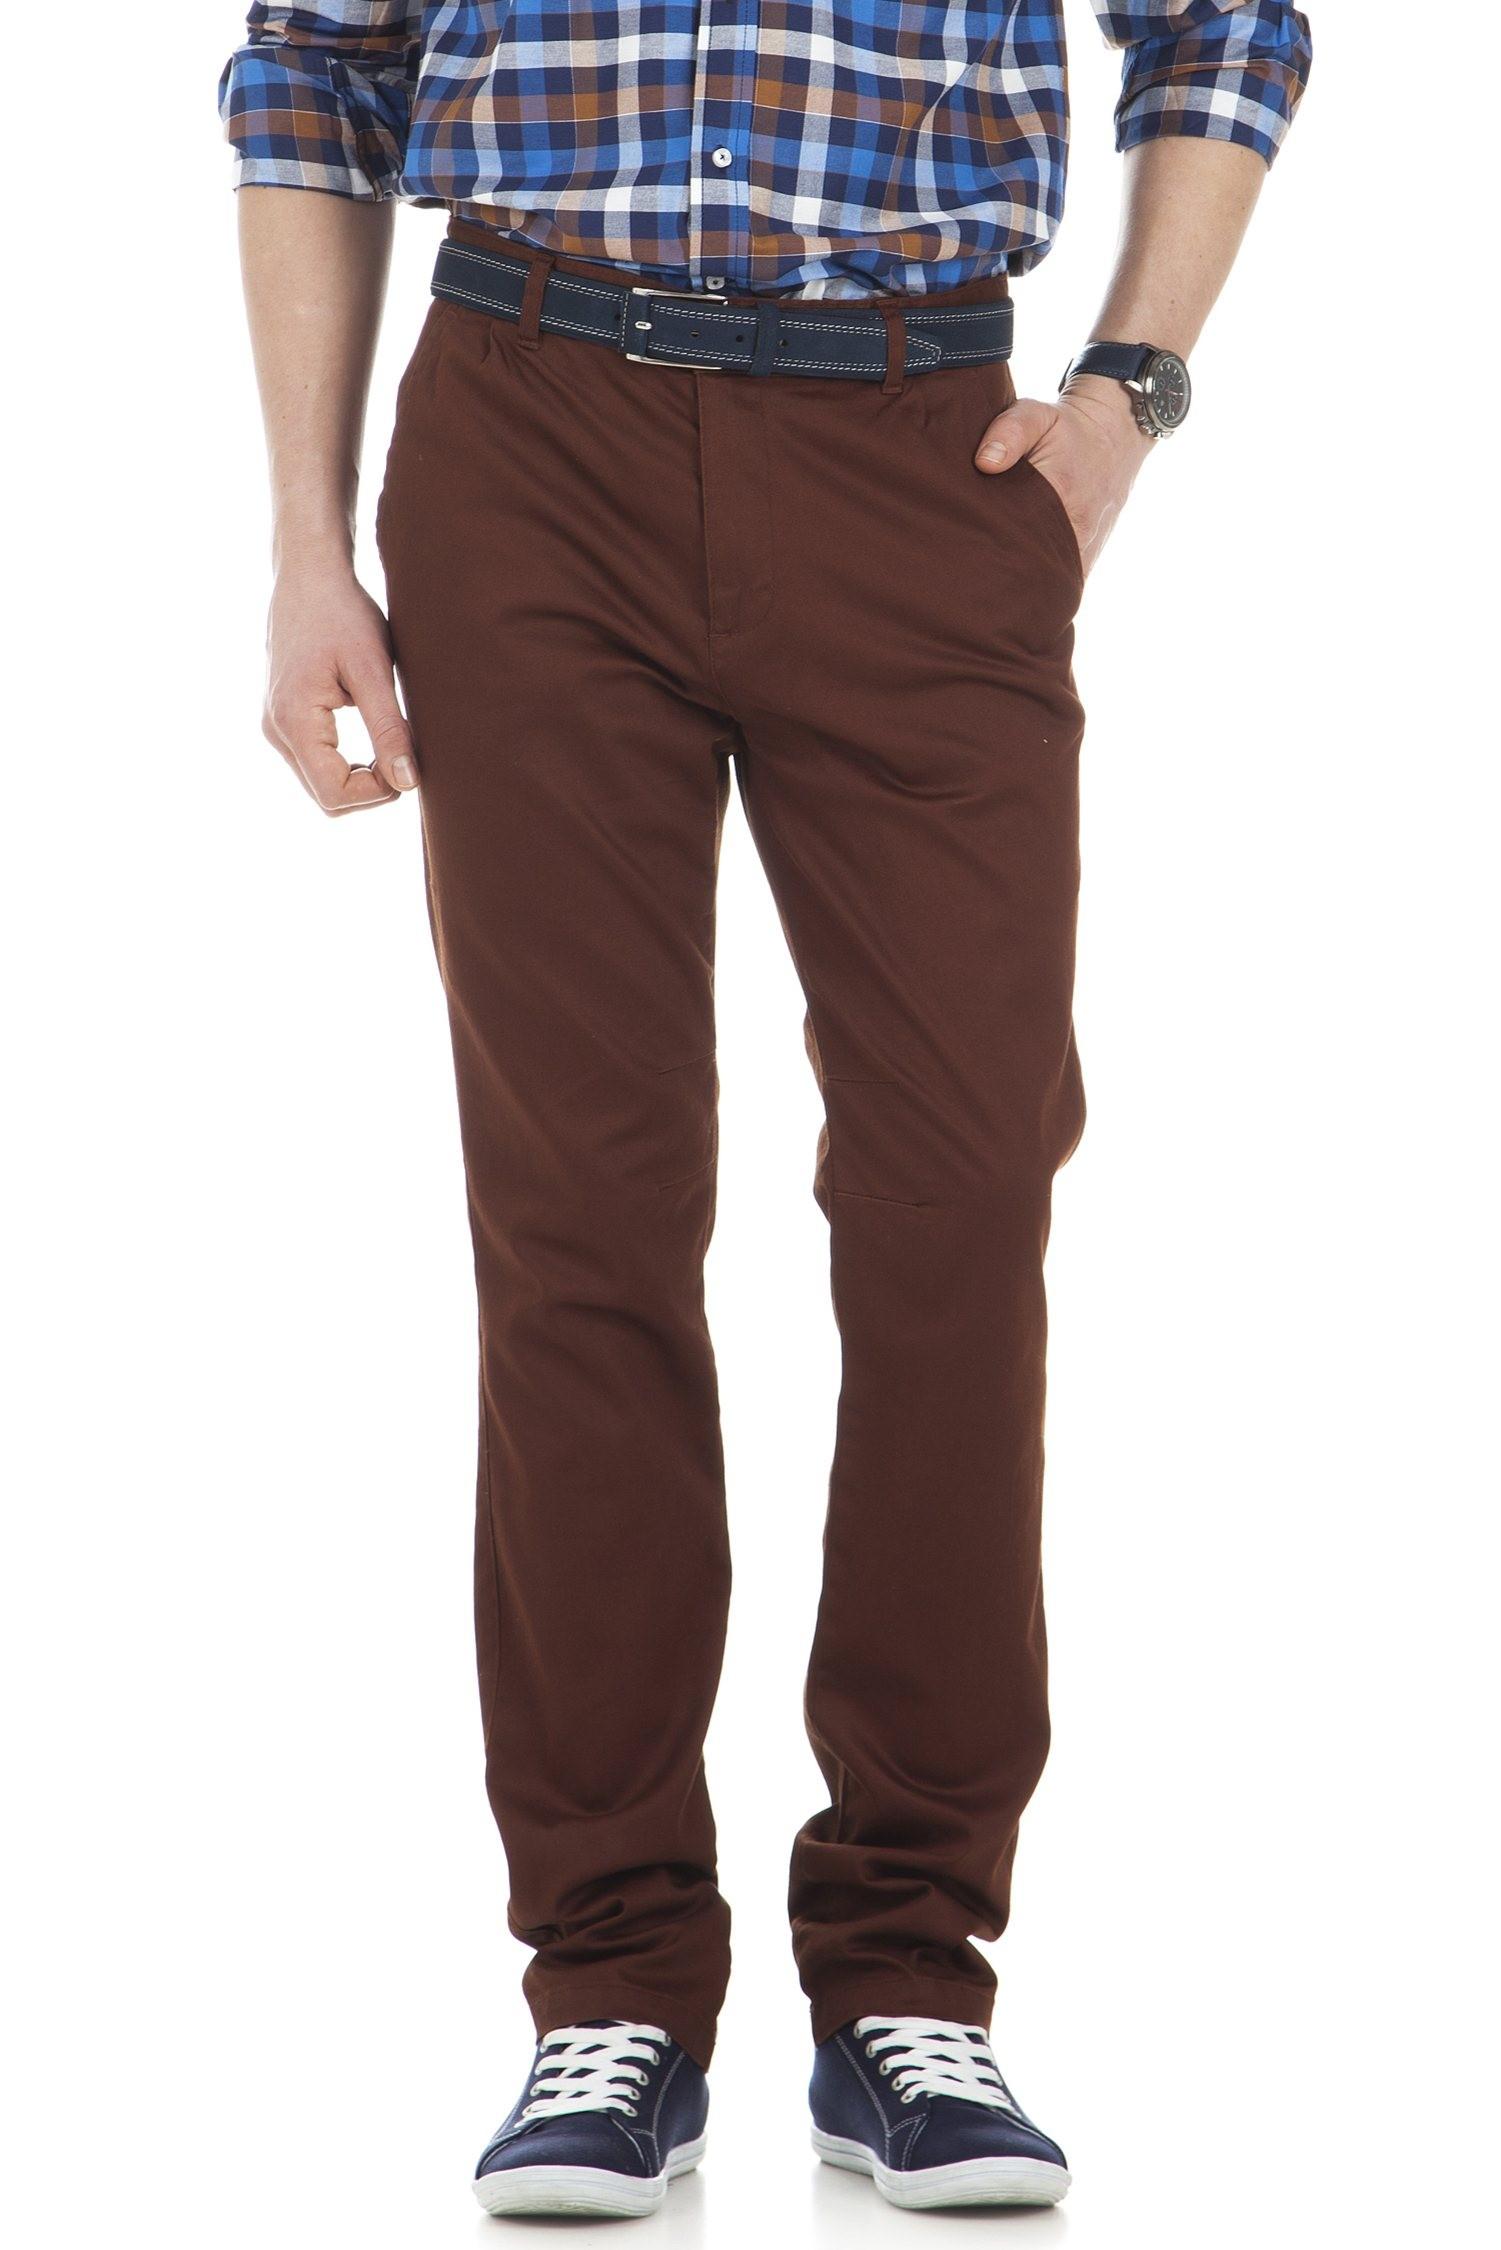 darpaca-pantolon-derikemer